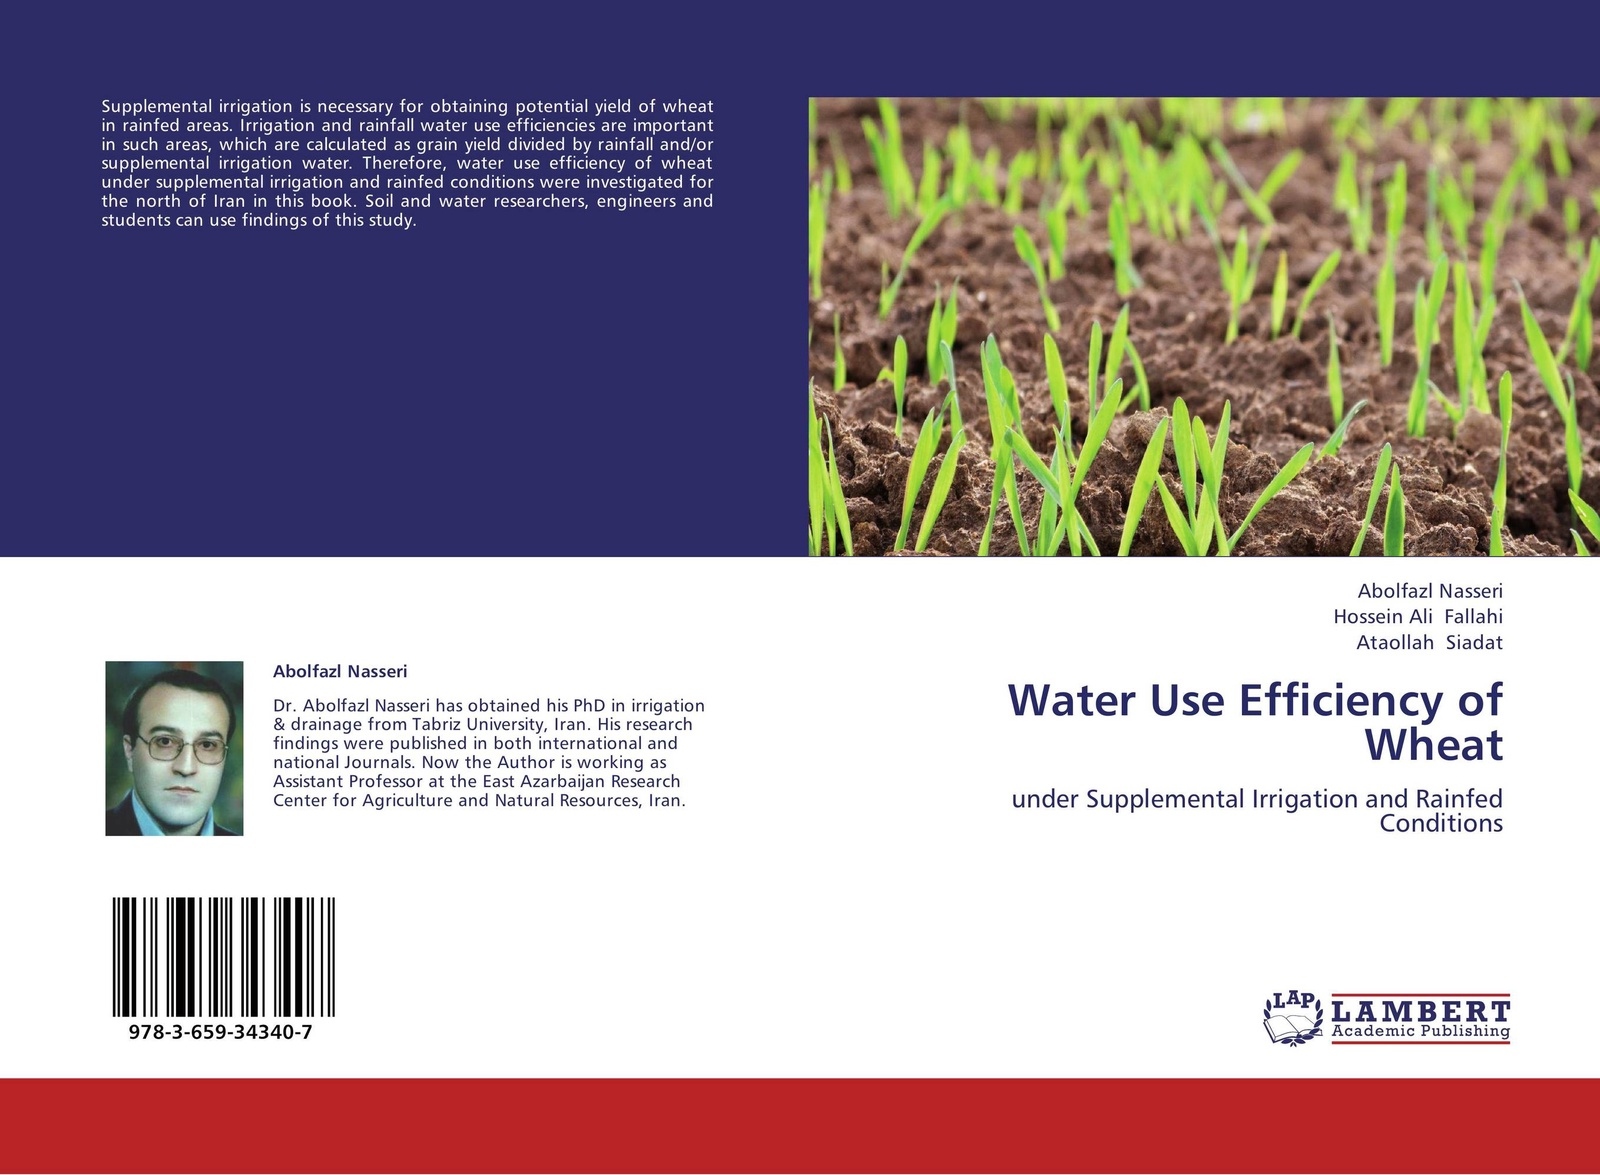 Abolfazl Nasseri,Hossein Ali Fallahi and Ataollah Siadat Water Use Efficiency of Wheat цены